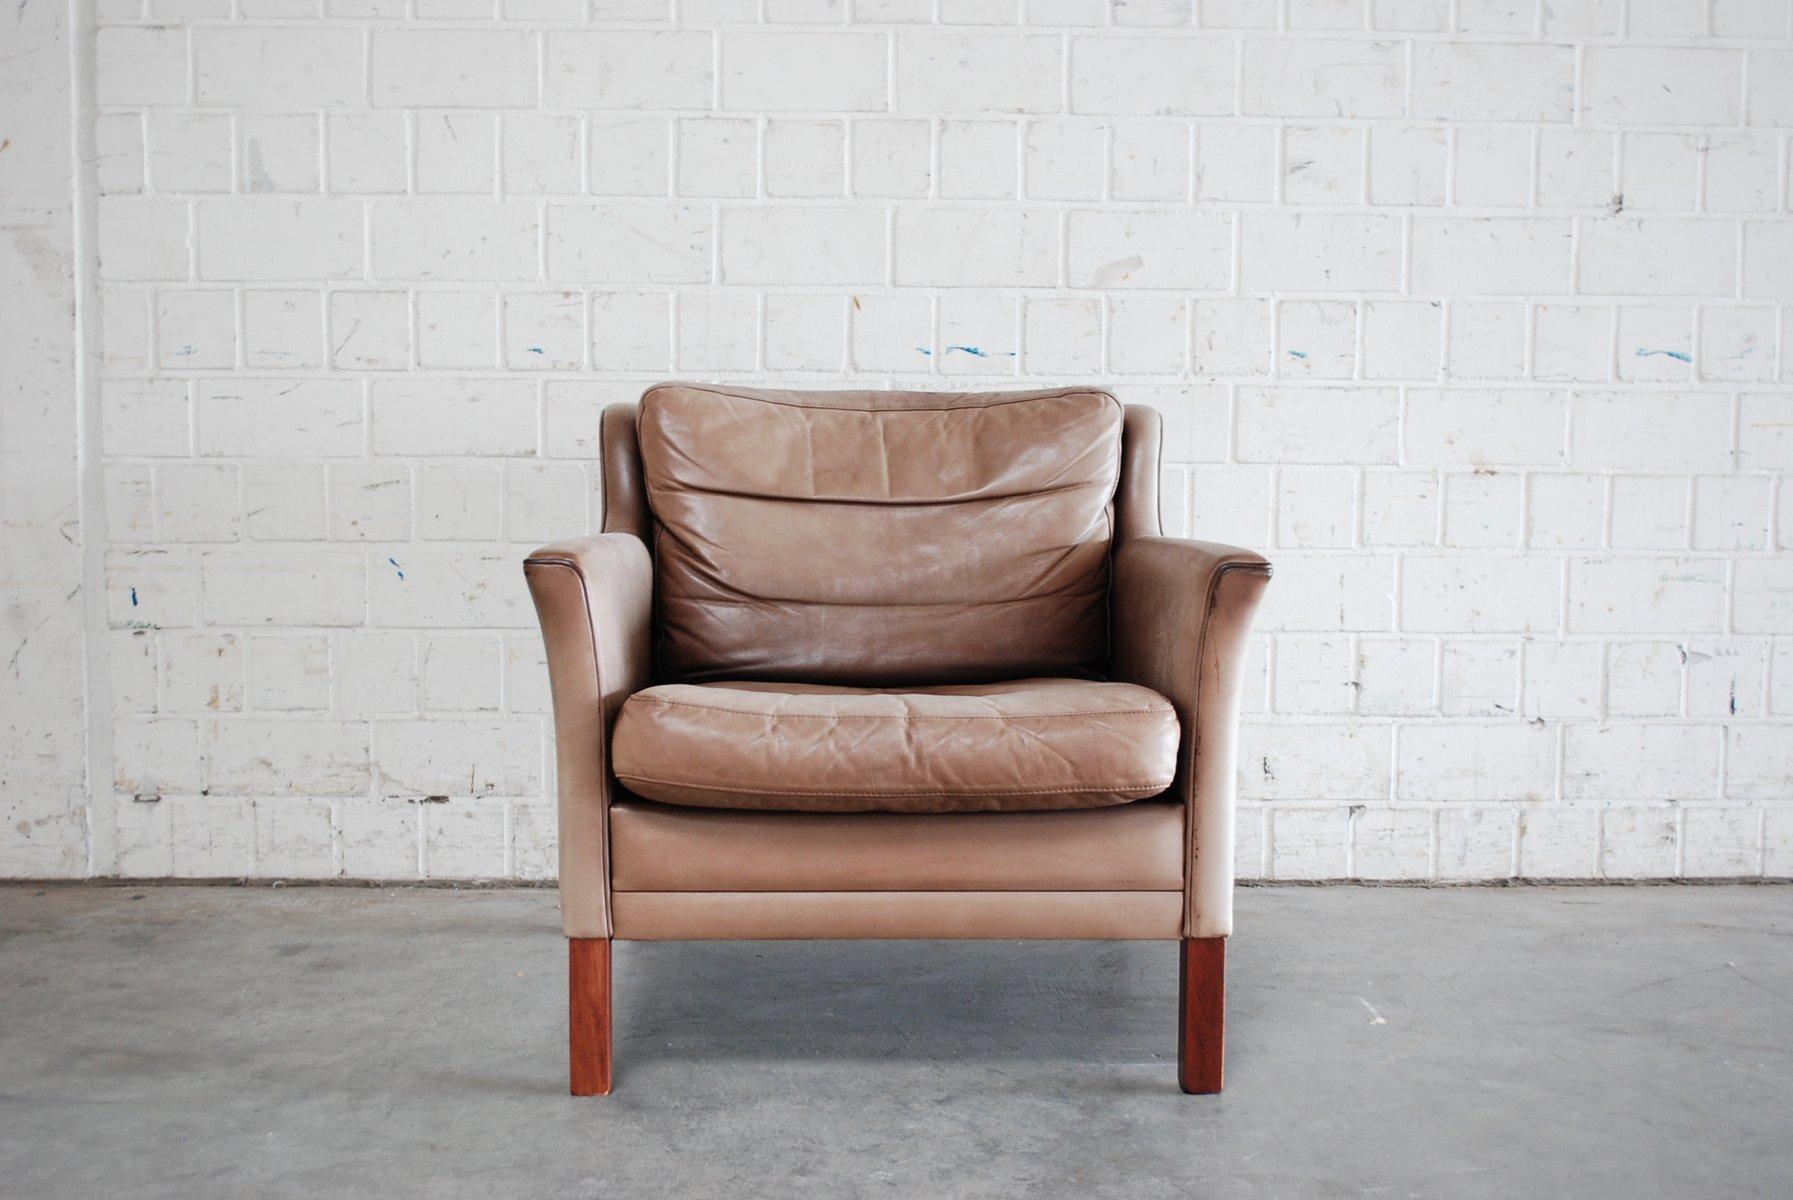 d nischer lounge stuhl aus leder buchenholz bei pamono kaufen. Black Bedroom Furniture Sets. Home Design Ideas